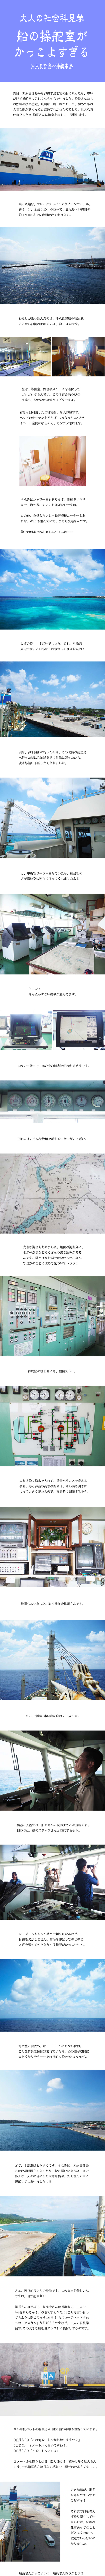 tomako180621.jpg